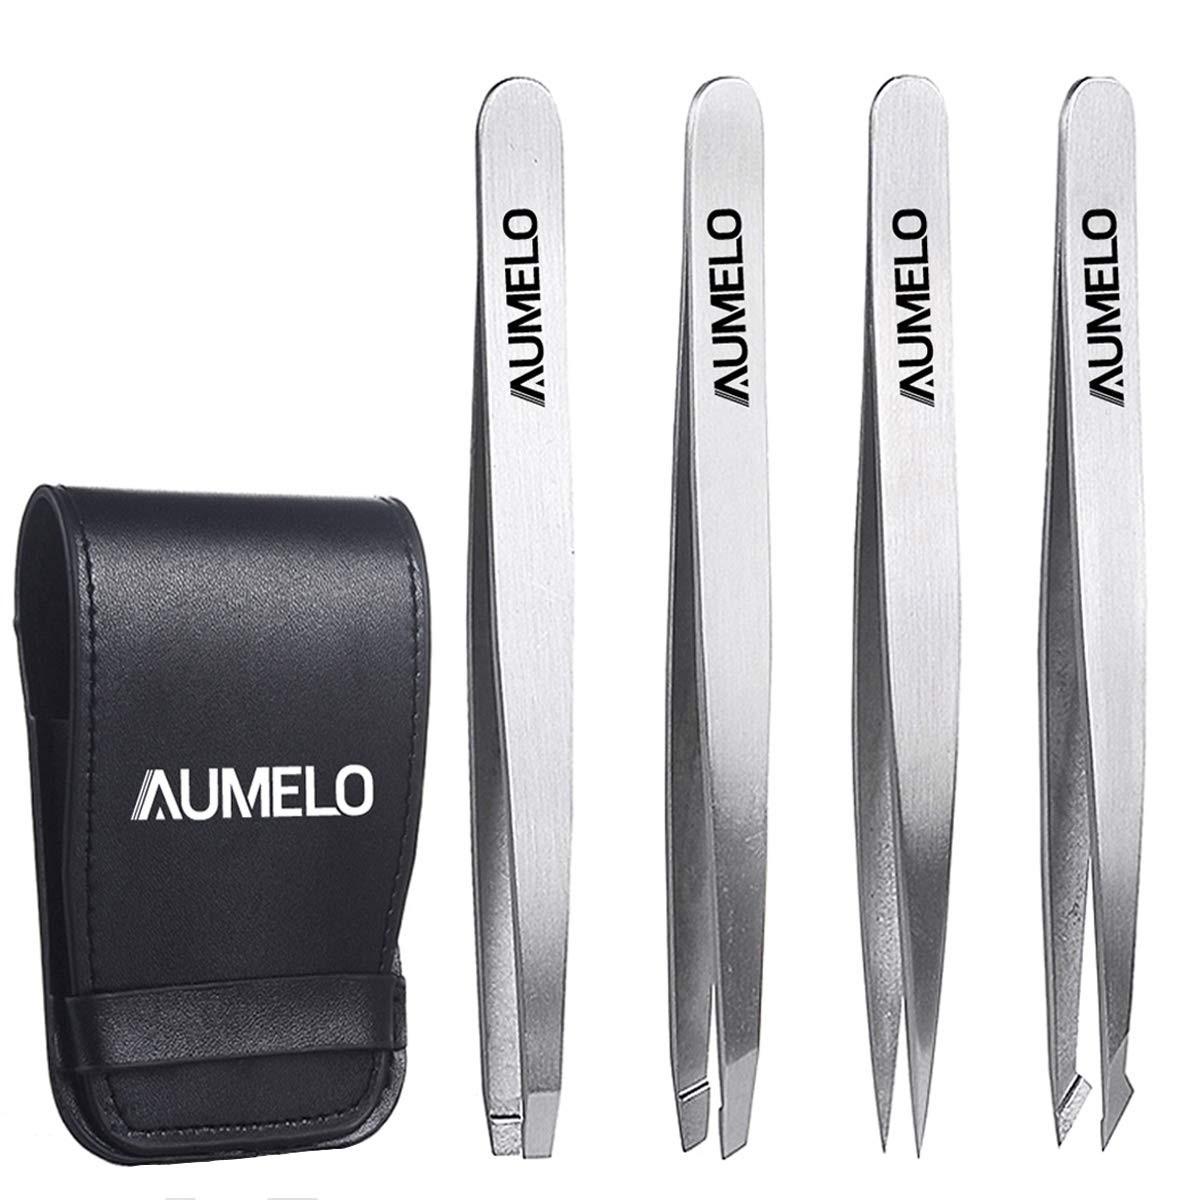 Tweezers Set 4-Piece - AUMELO Professional Stainless Steel Slant Tip and Pointed Eyebrow Tweezers